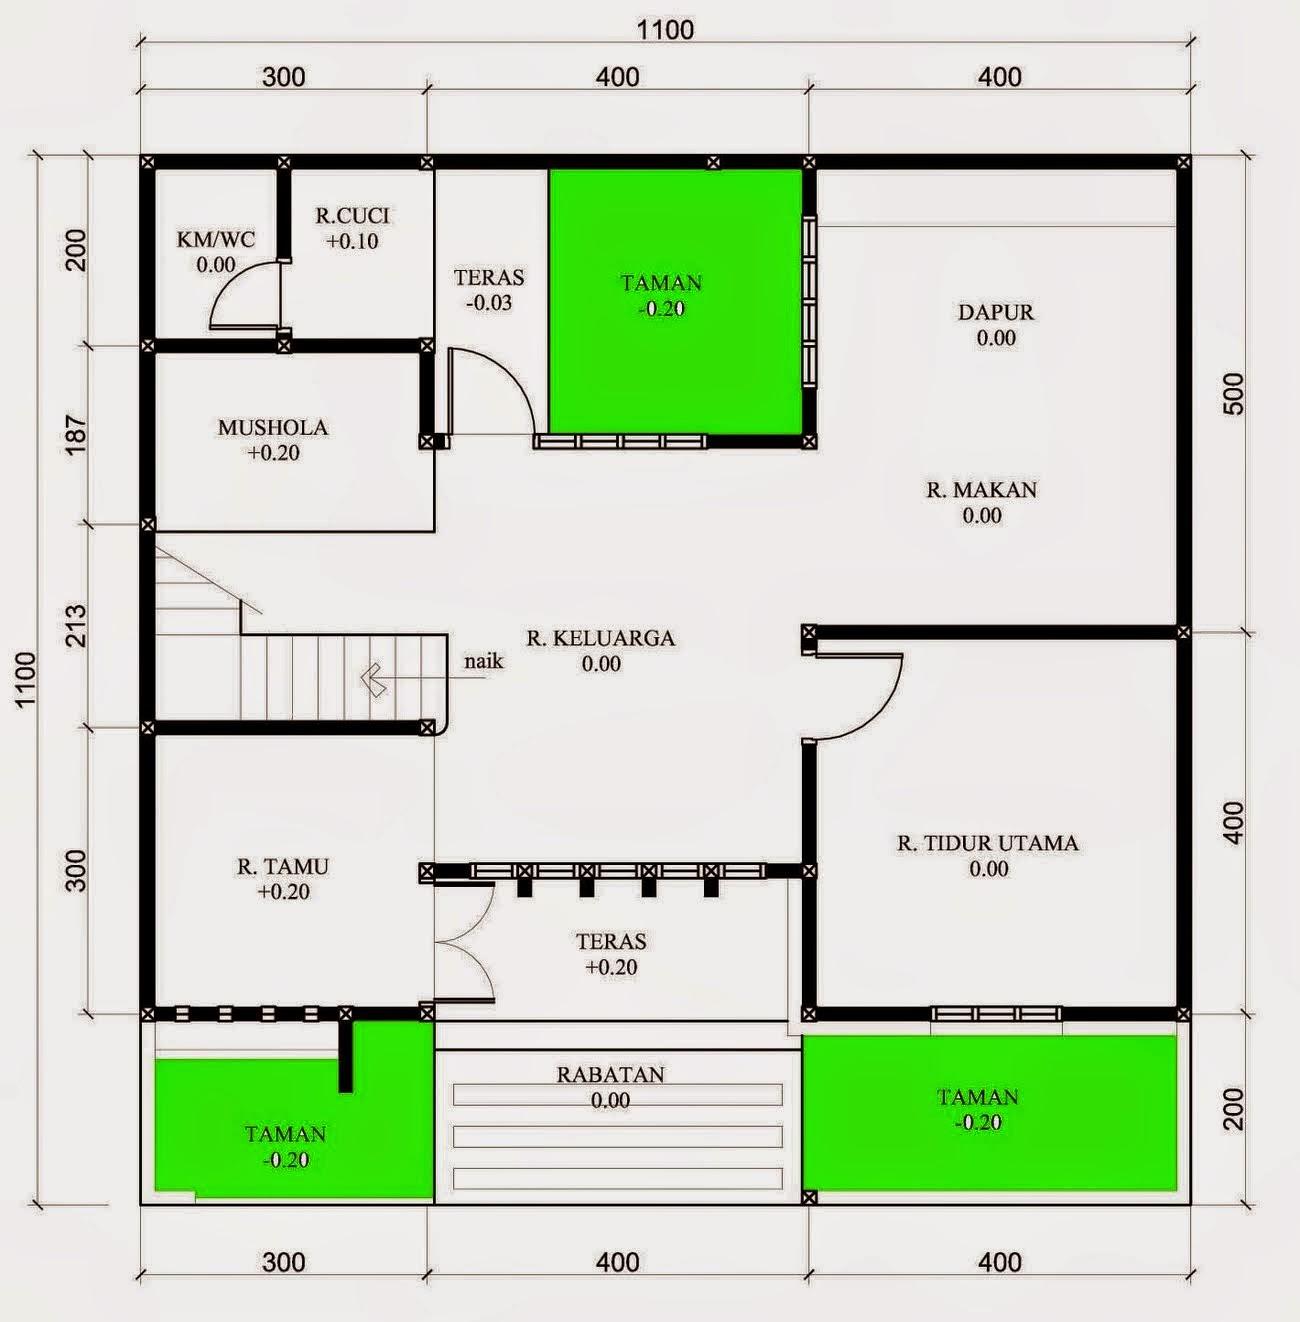 Ukuran Rumah Minimalis 2 Kamar Dshdesign4kinfo